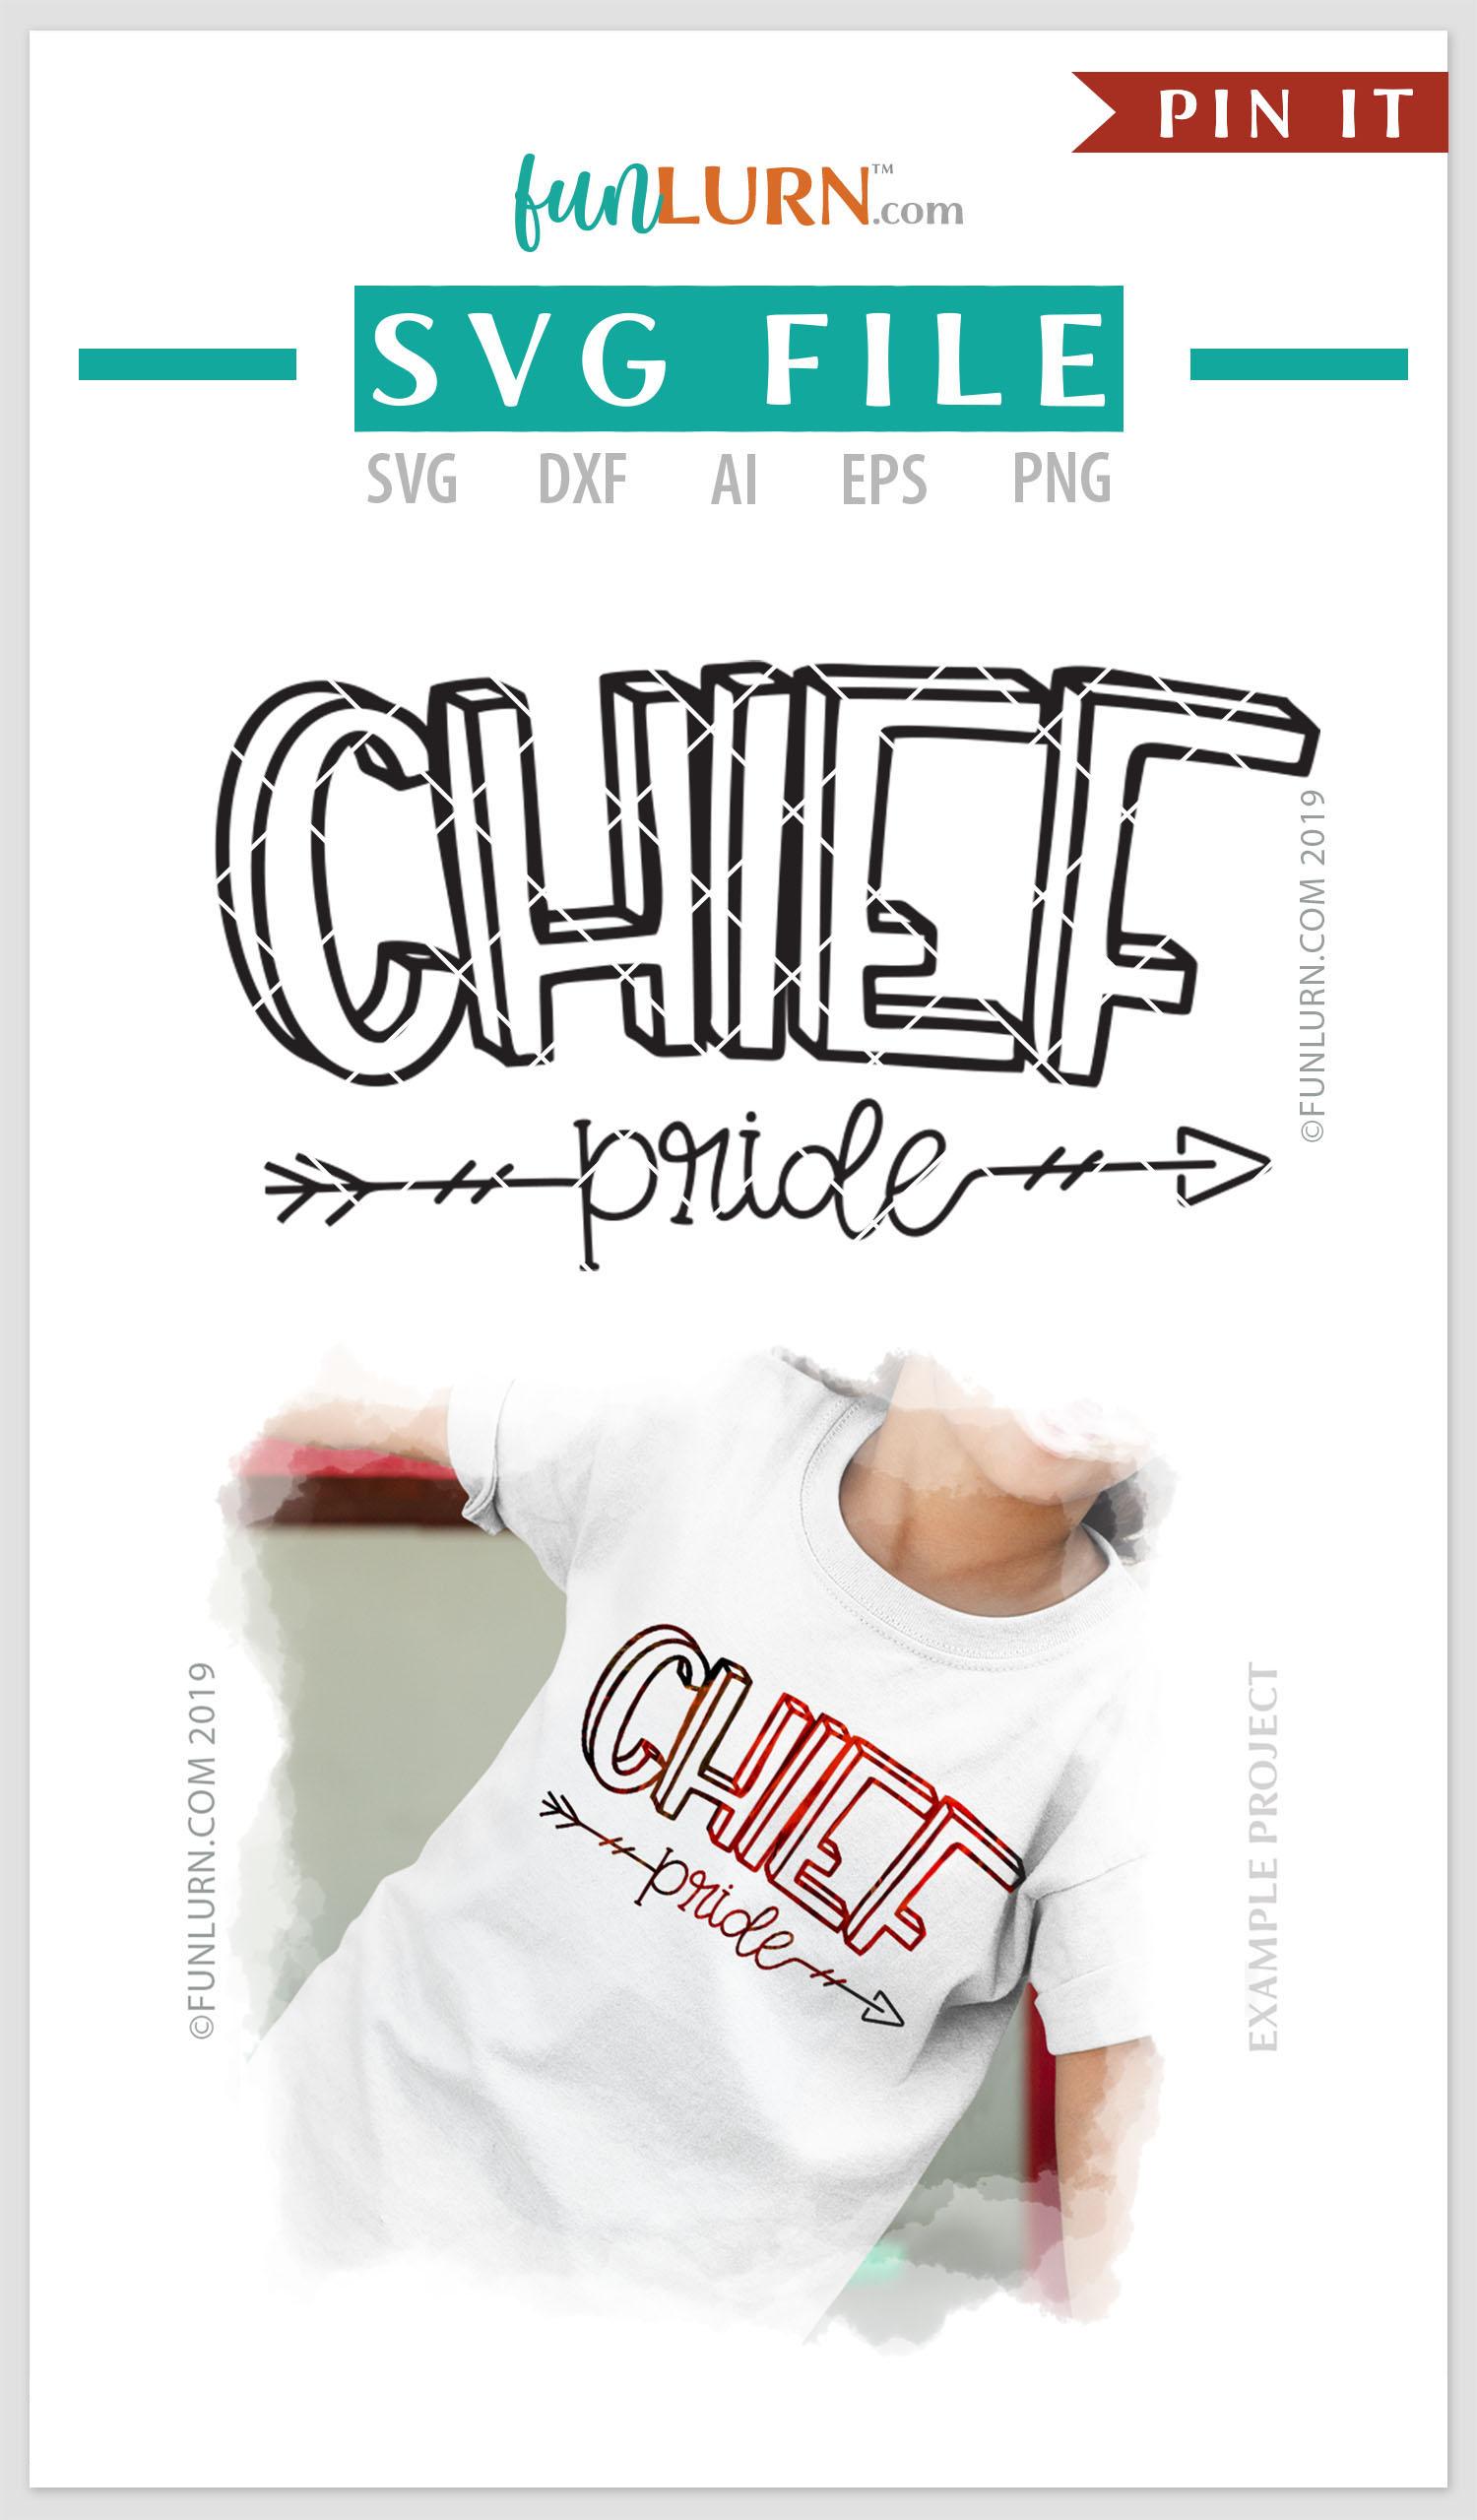 Chief Pride Team SVG Cut File example image 4